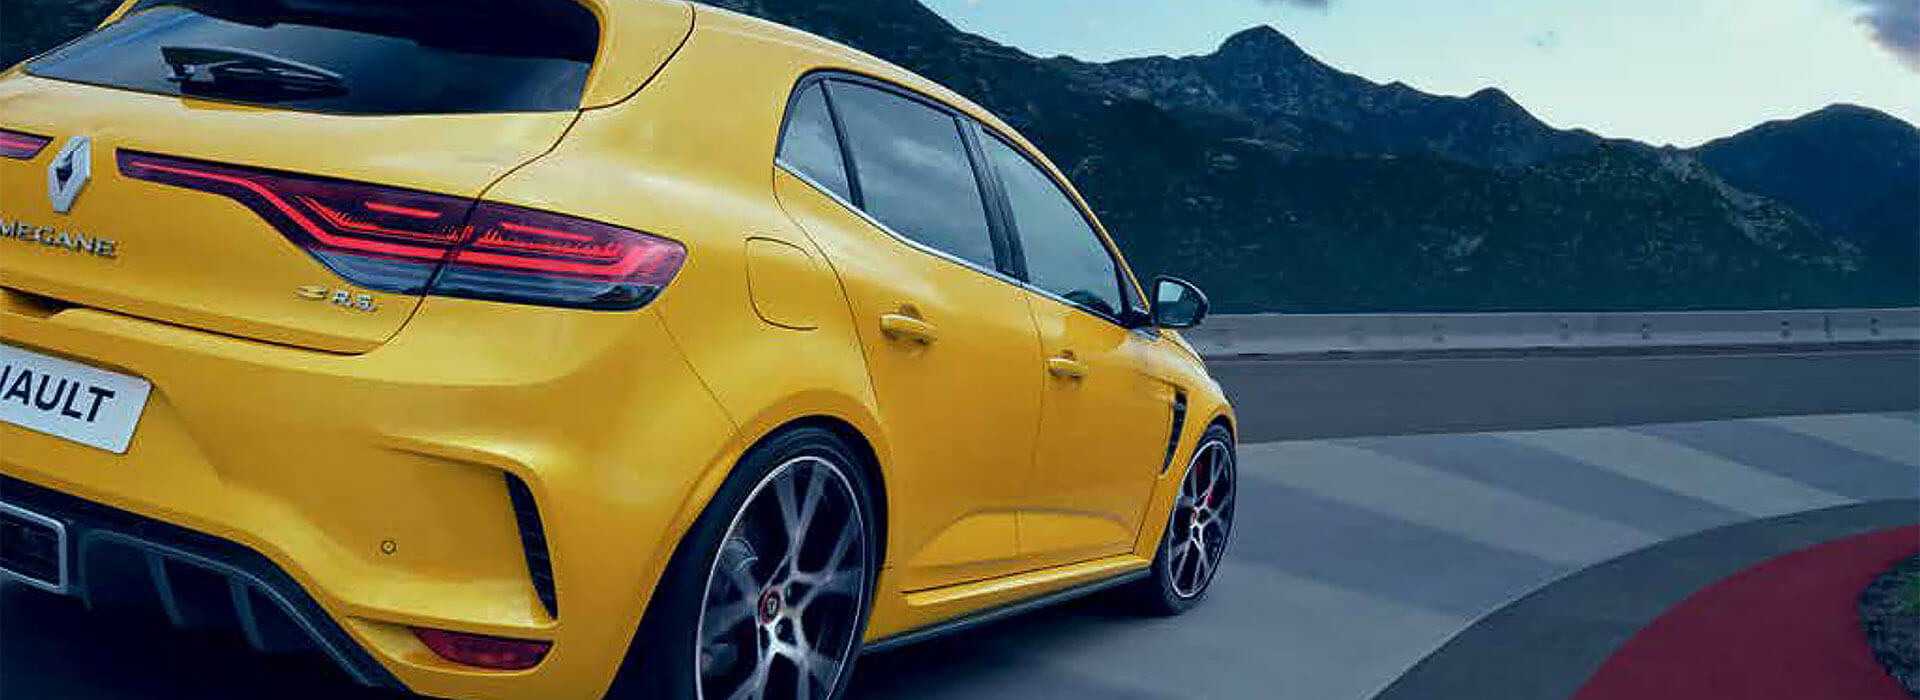 Trinity Renault Careers